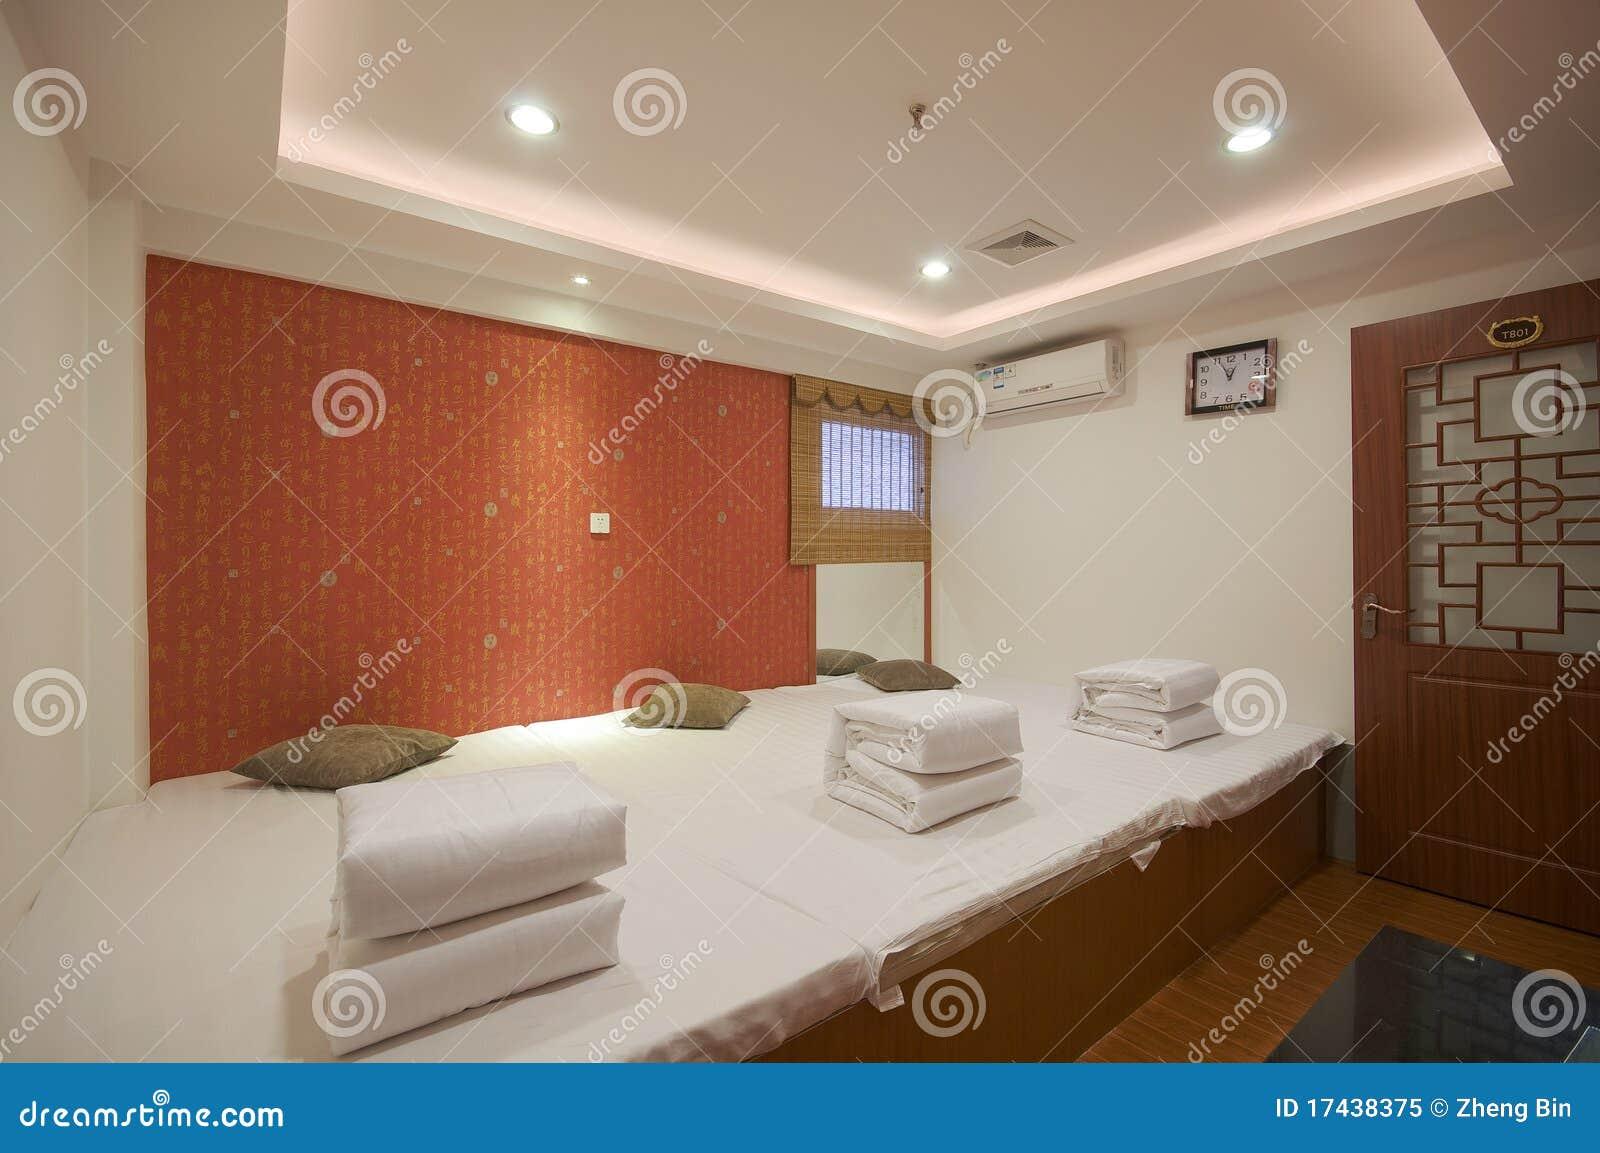 darwsensual massage exoctic massages